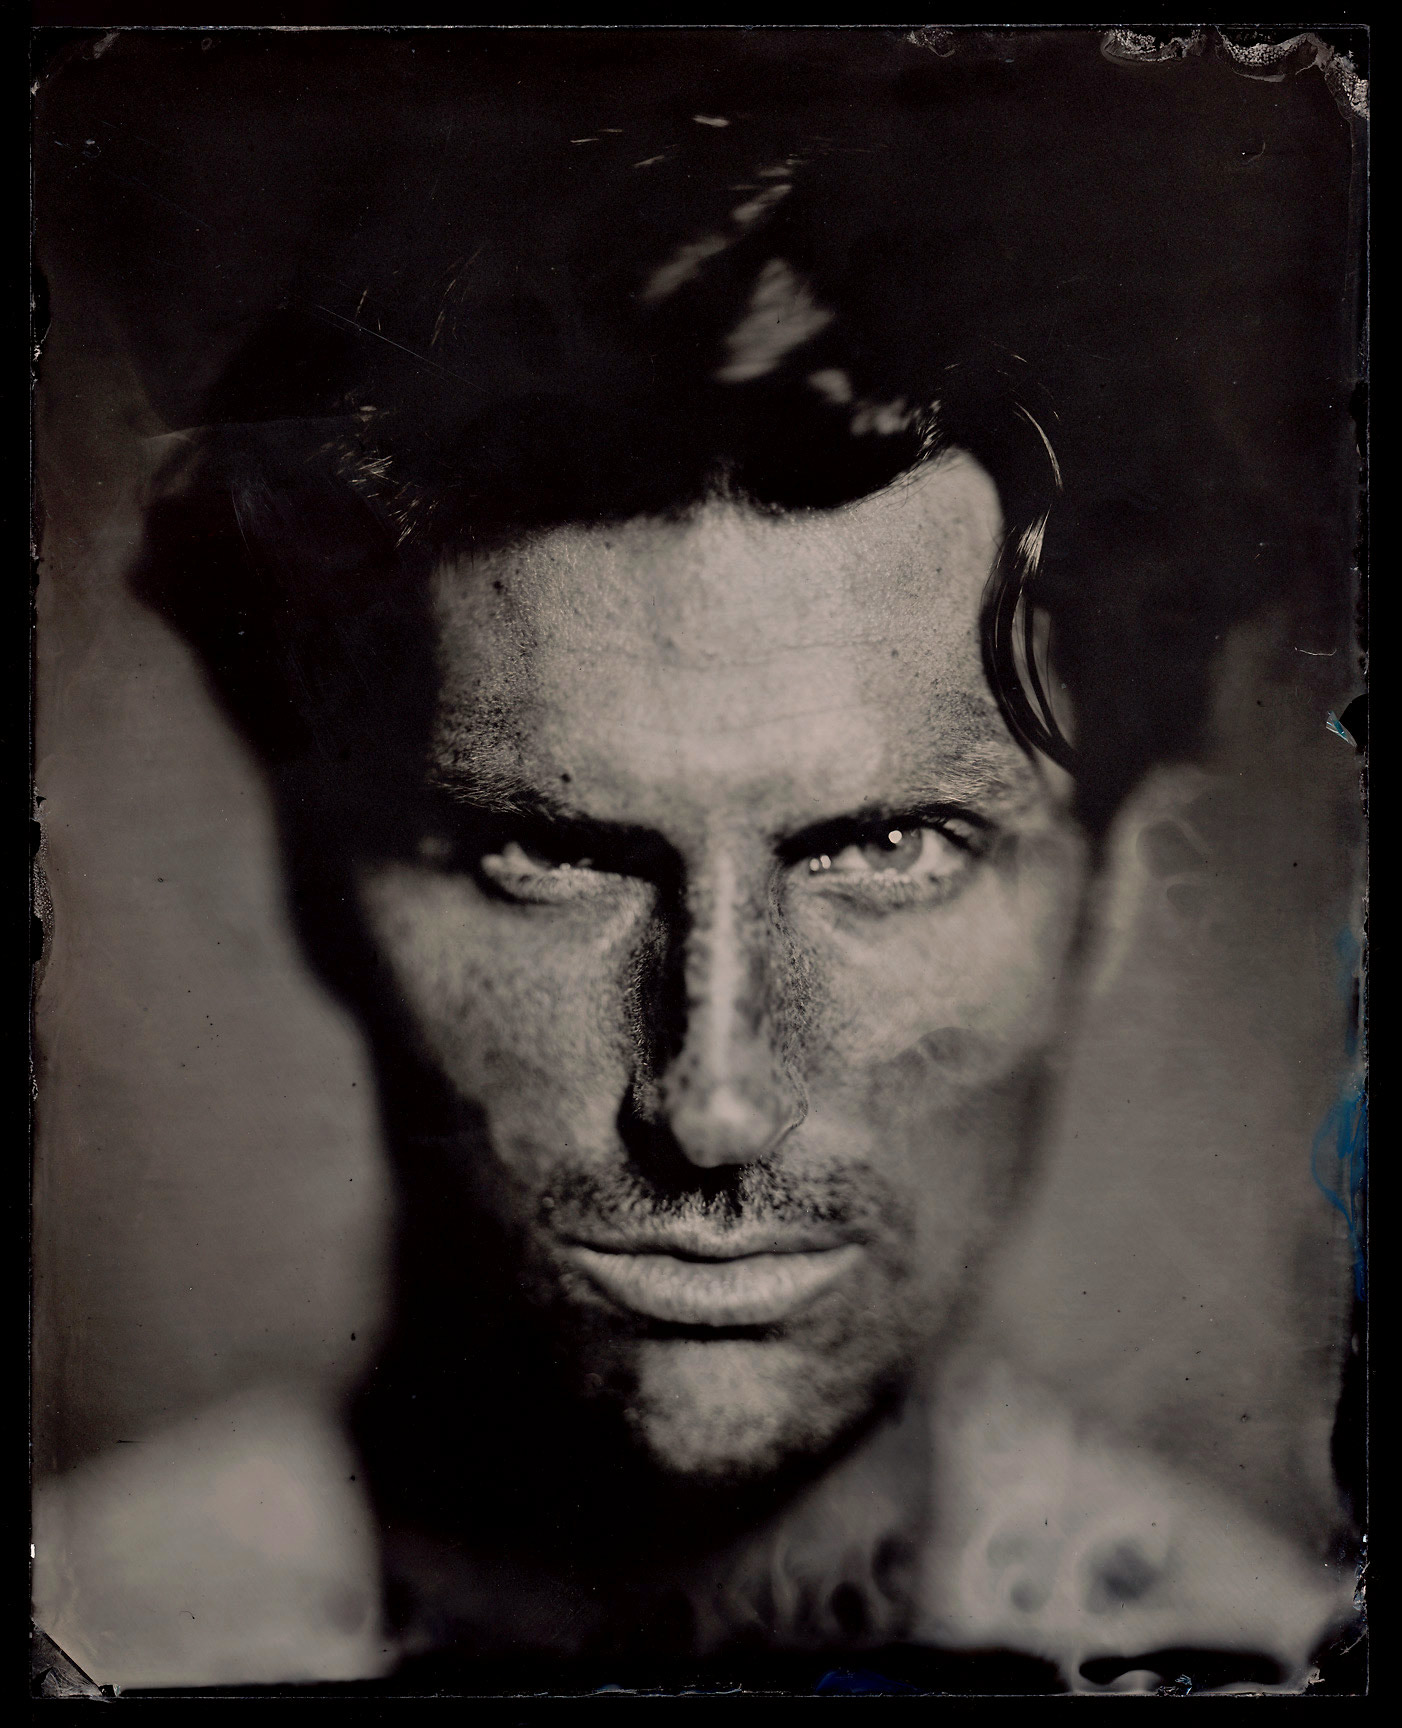 JAMES-WEBER-PHOTOGRAPHER-PORTRAITS-13475.jpg